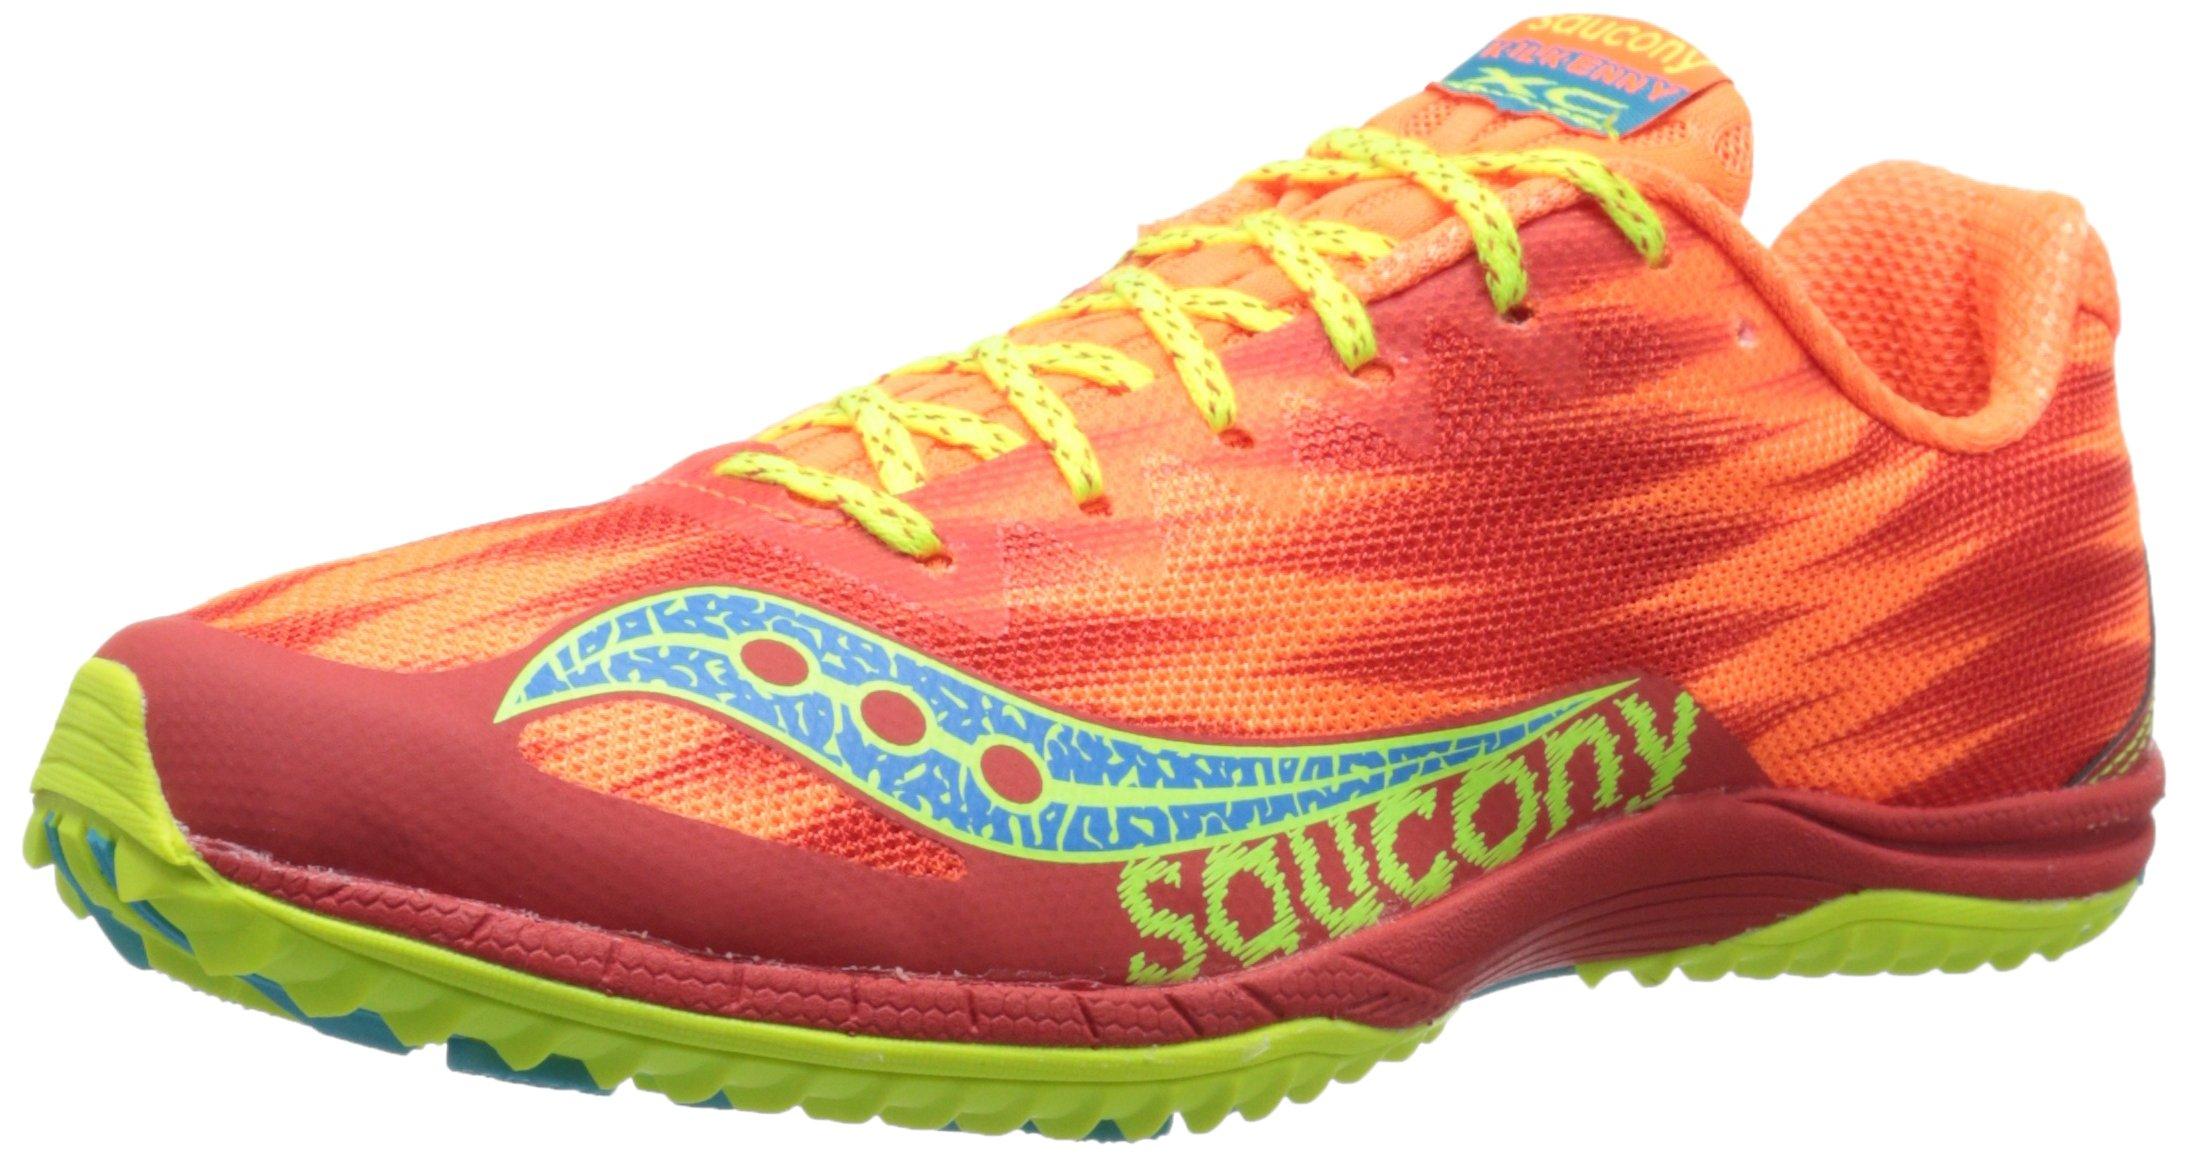 Saucony Women's Kilkenny XC5 Flat Racing Shoe